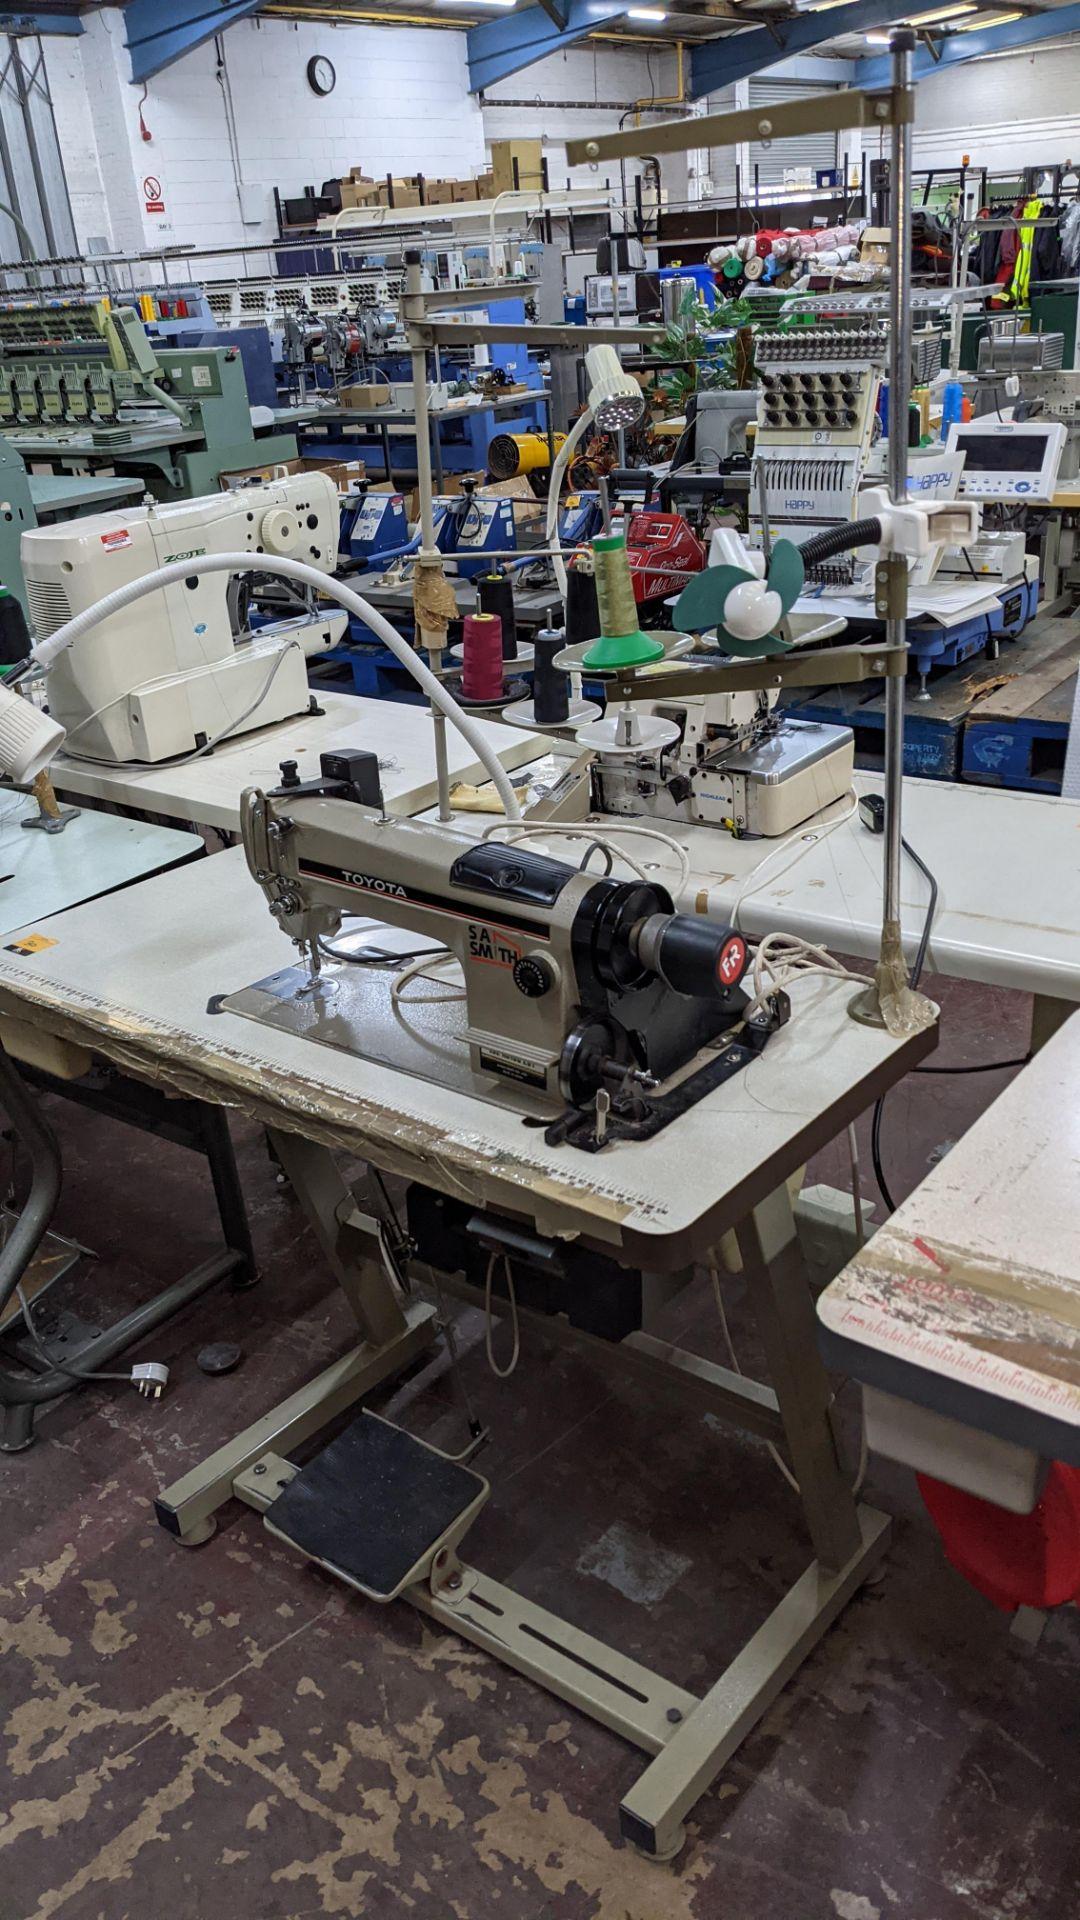 Toyota sewing machine - Image 3 of 17